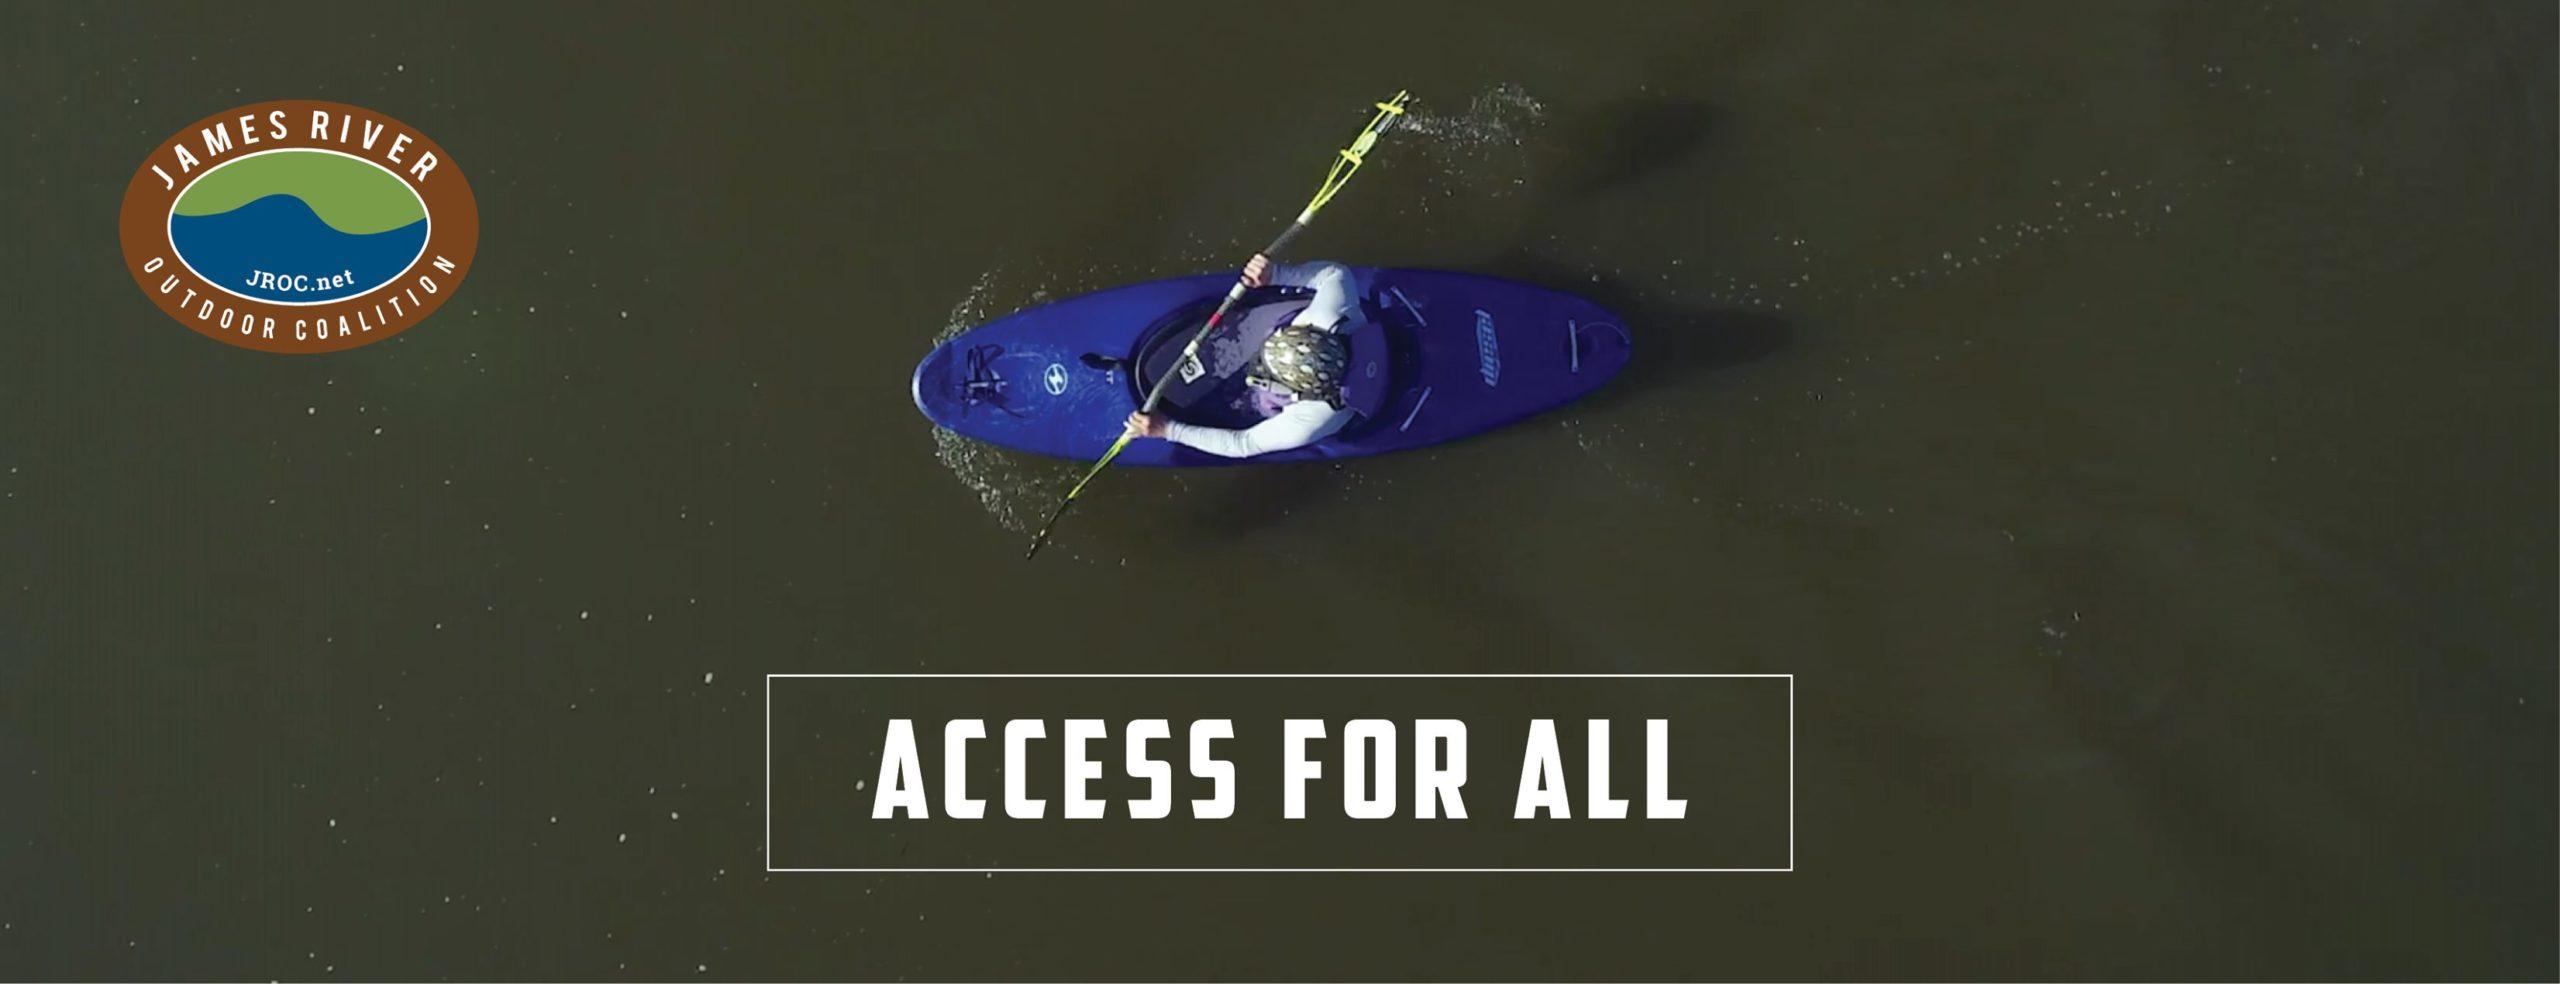 JROC Seeks Universal Boating Access at Huguenot Flatwater